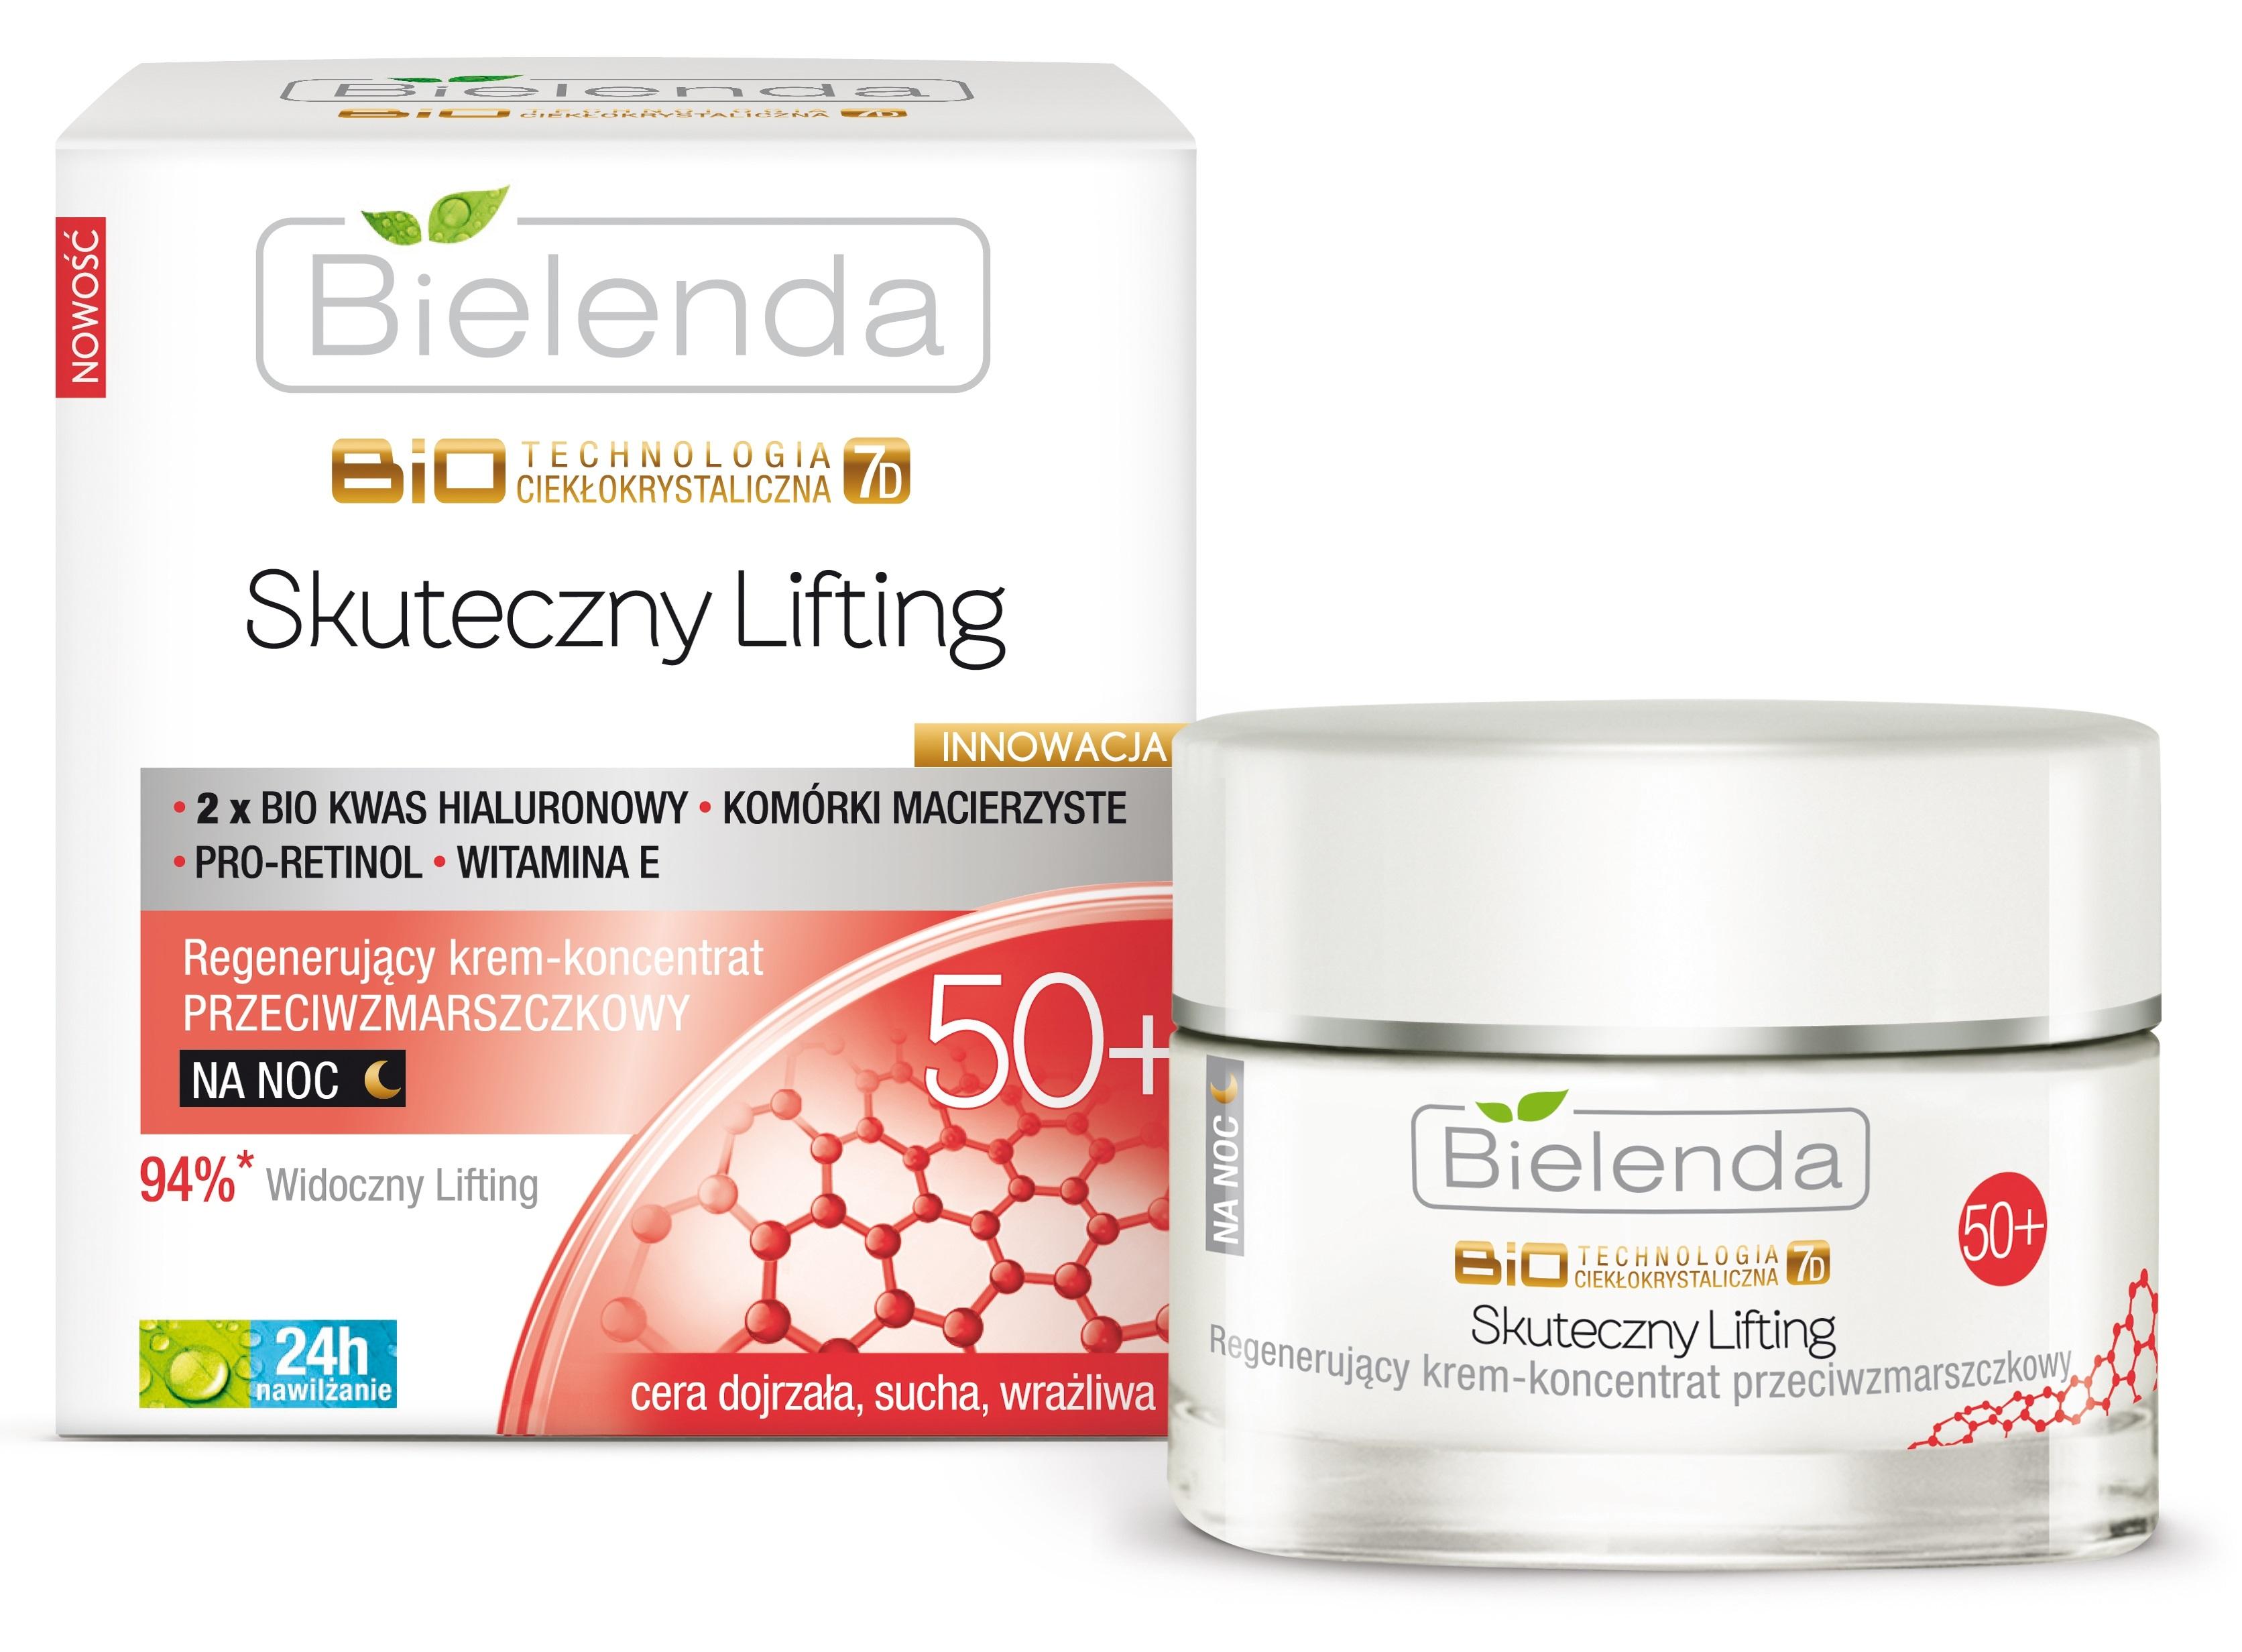 Биотехнология 7D, Восстанавливающий ночной крем 50+,  50 мл.  Bielenda